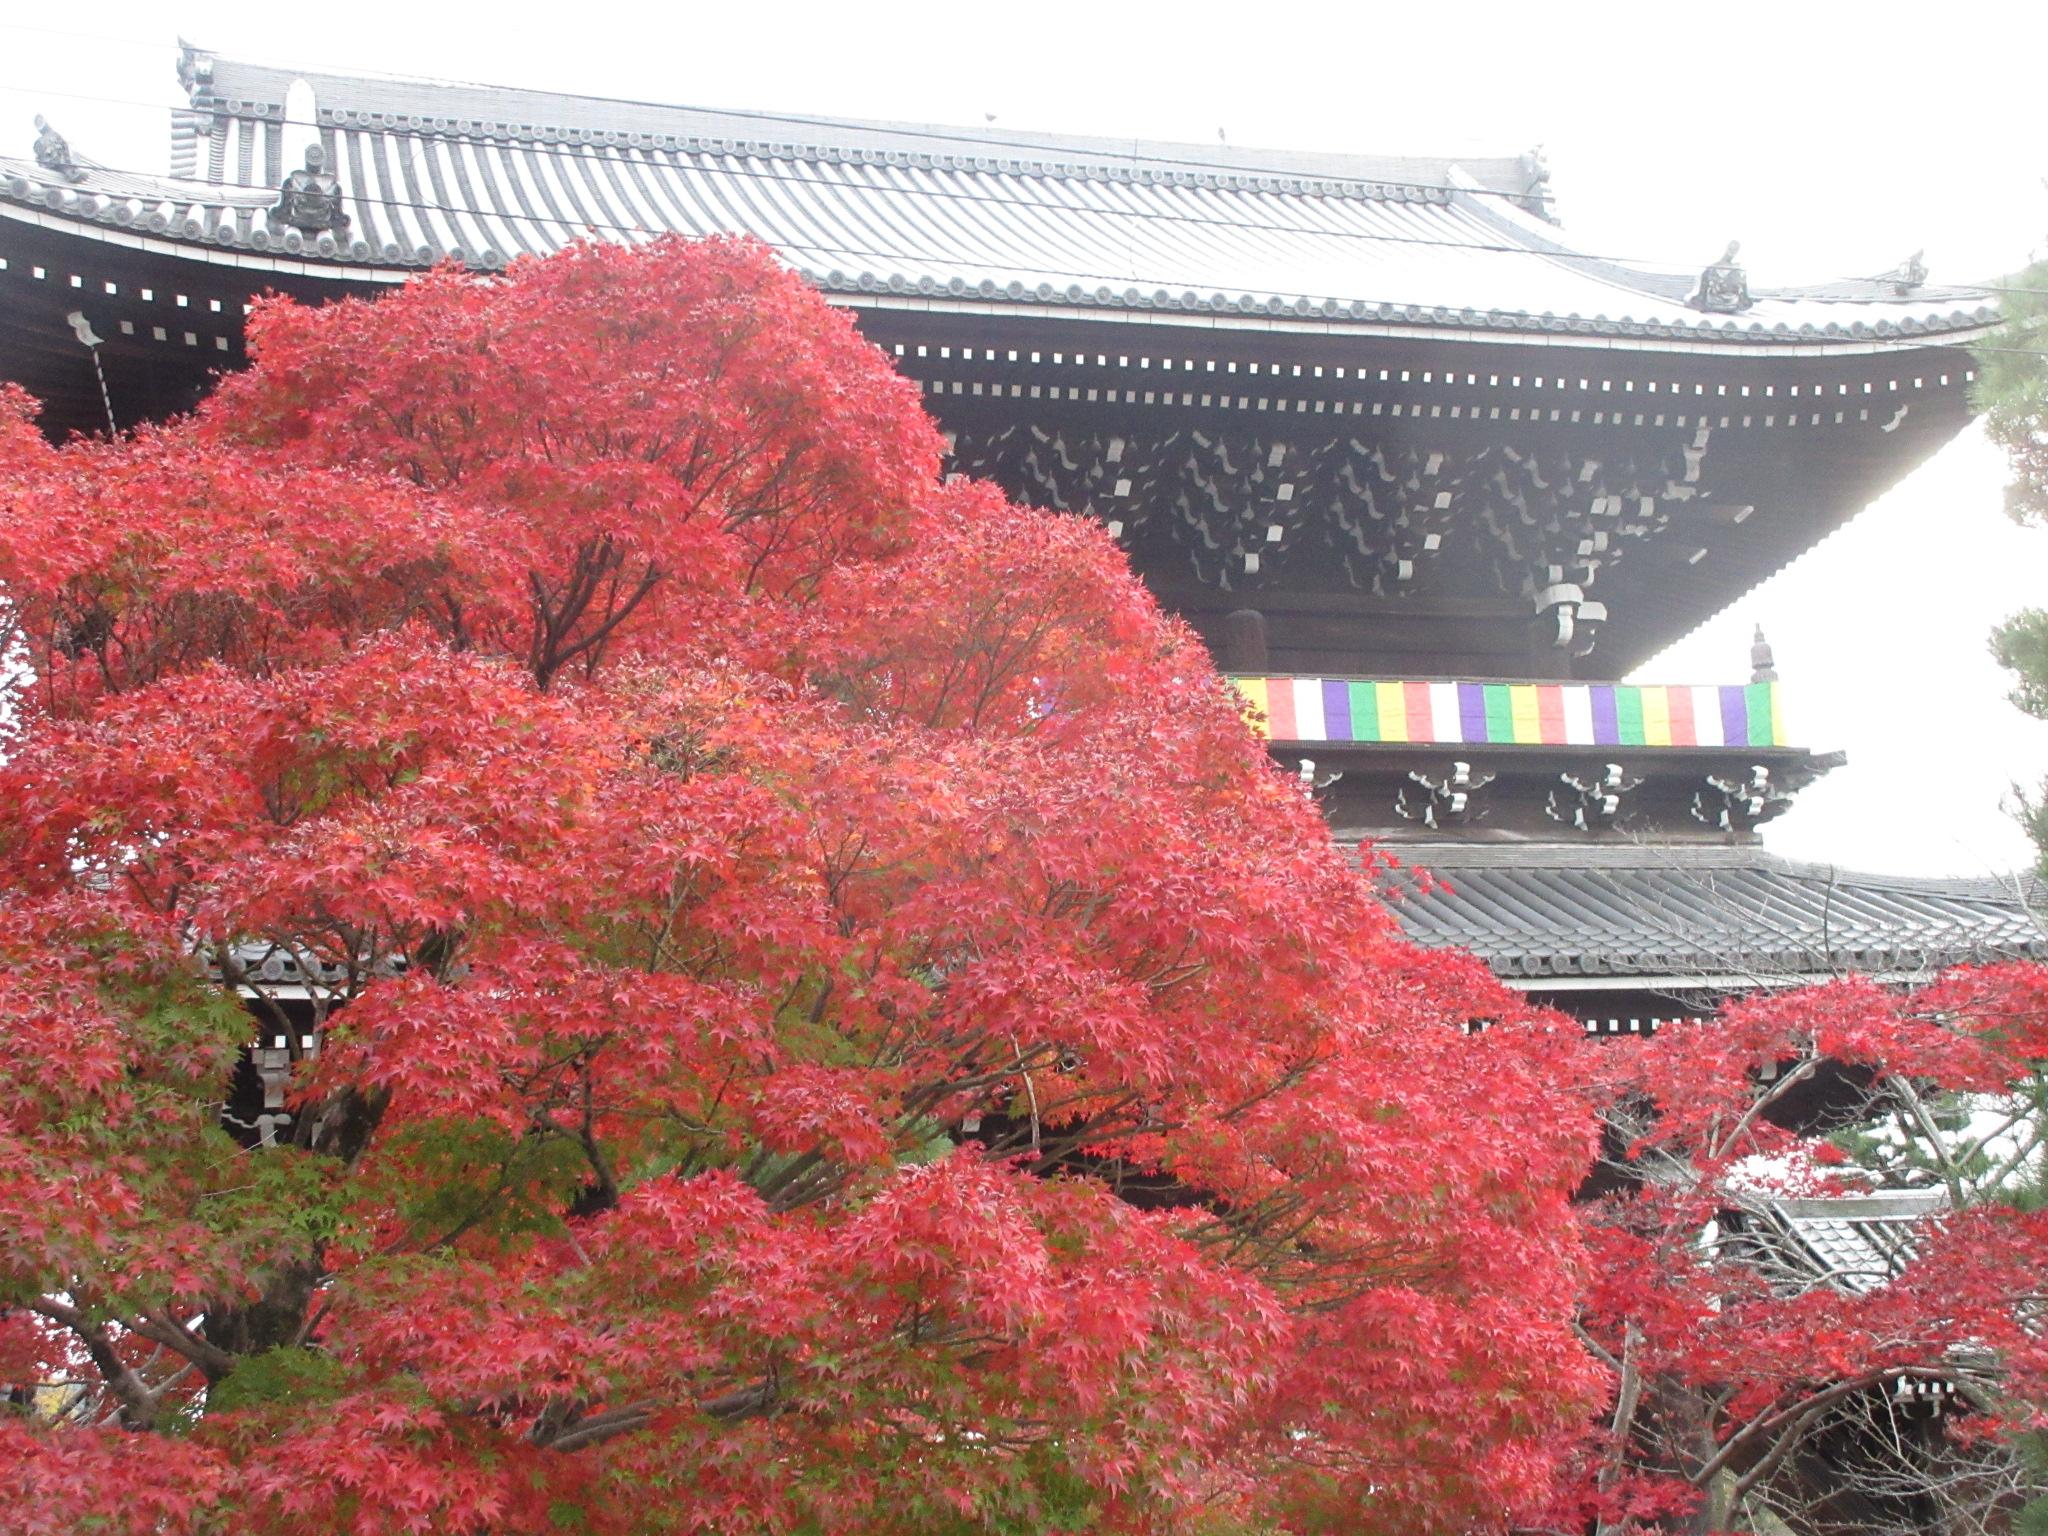 http://www.inoue-satoshi.com/diary/%E9%BB%92%E8%B0%B7%E5%B1%B1%E9%96%80.JPG